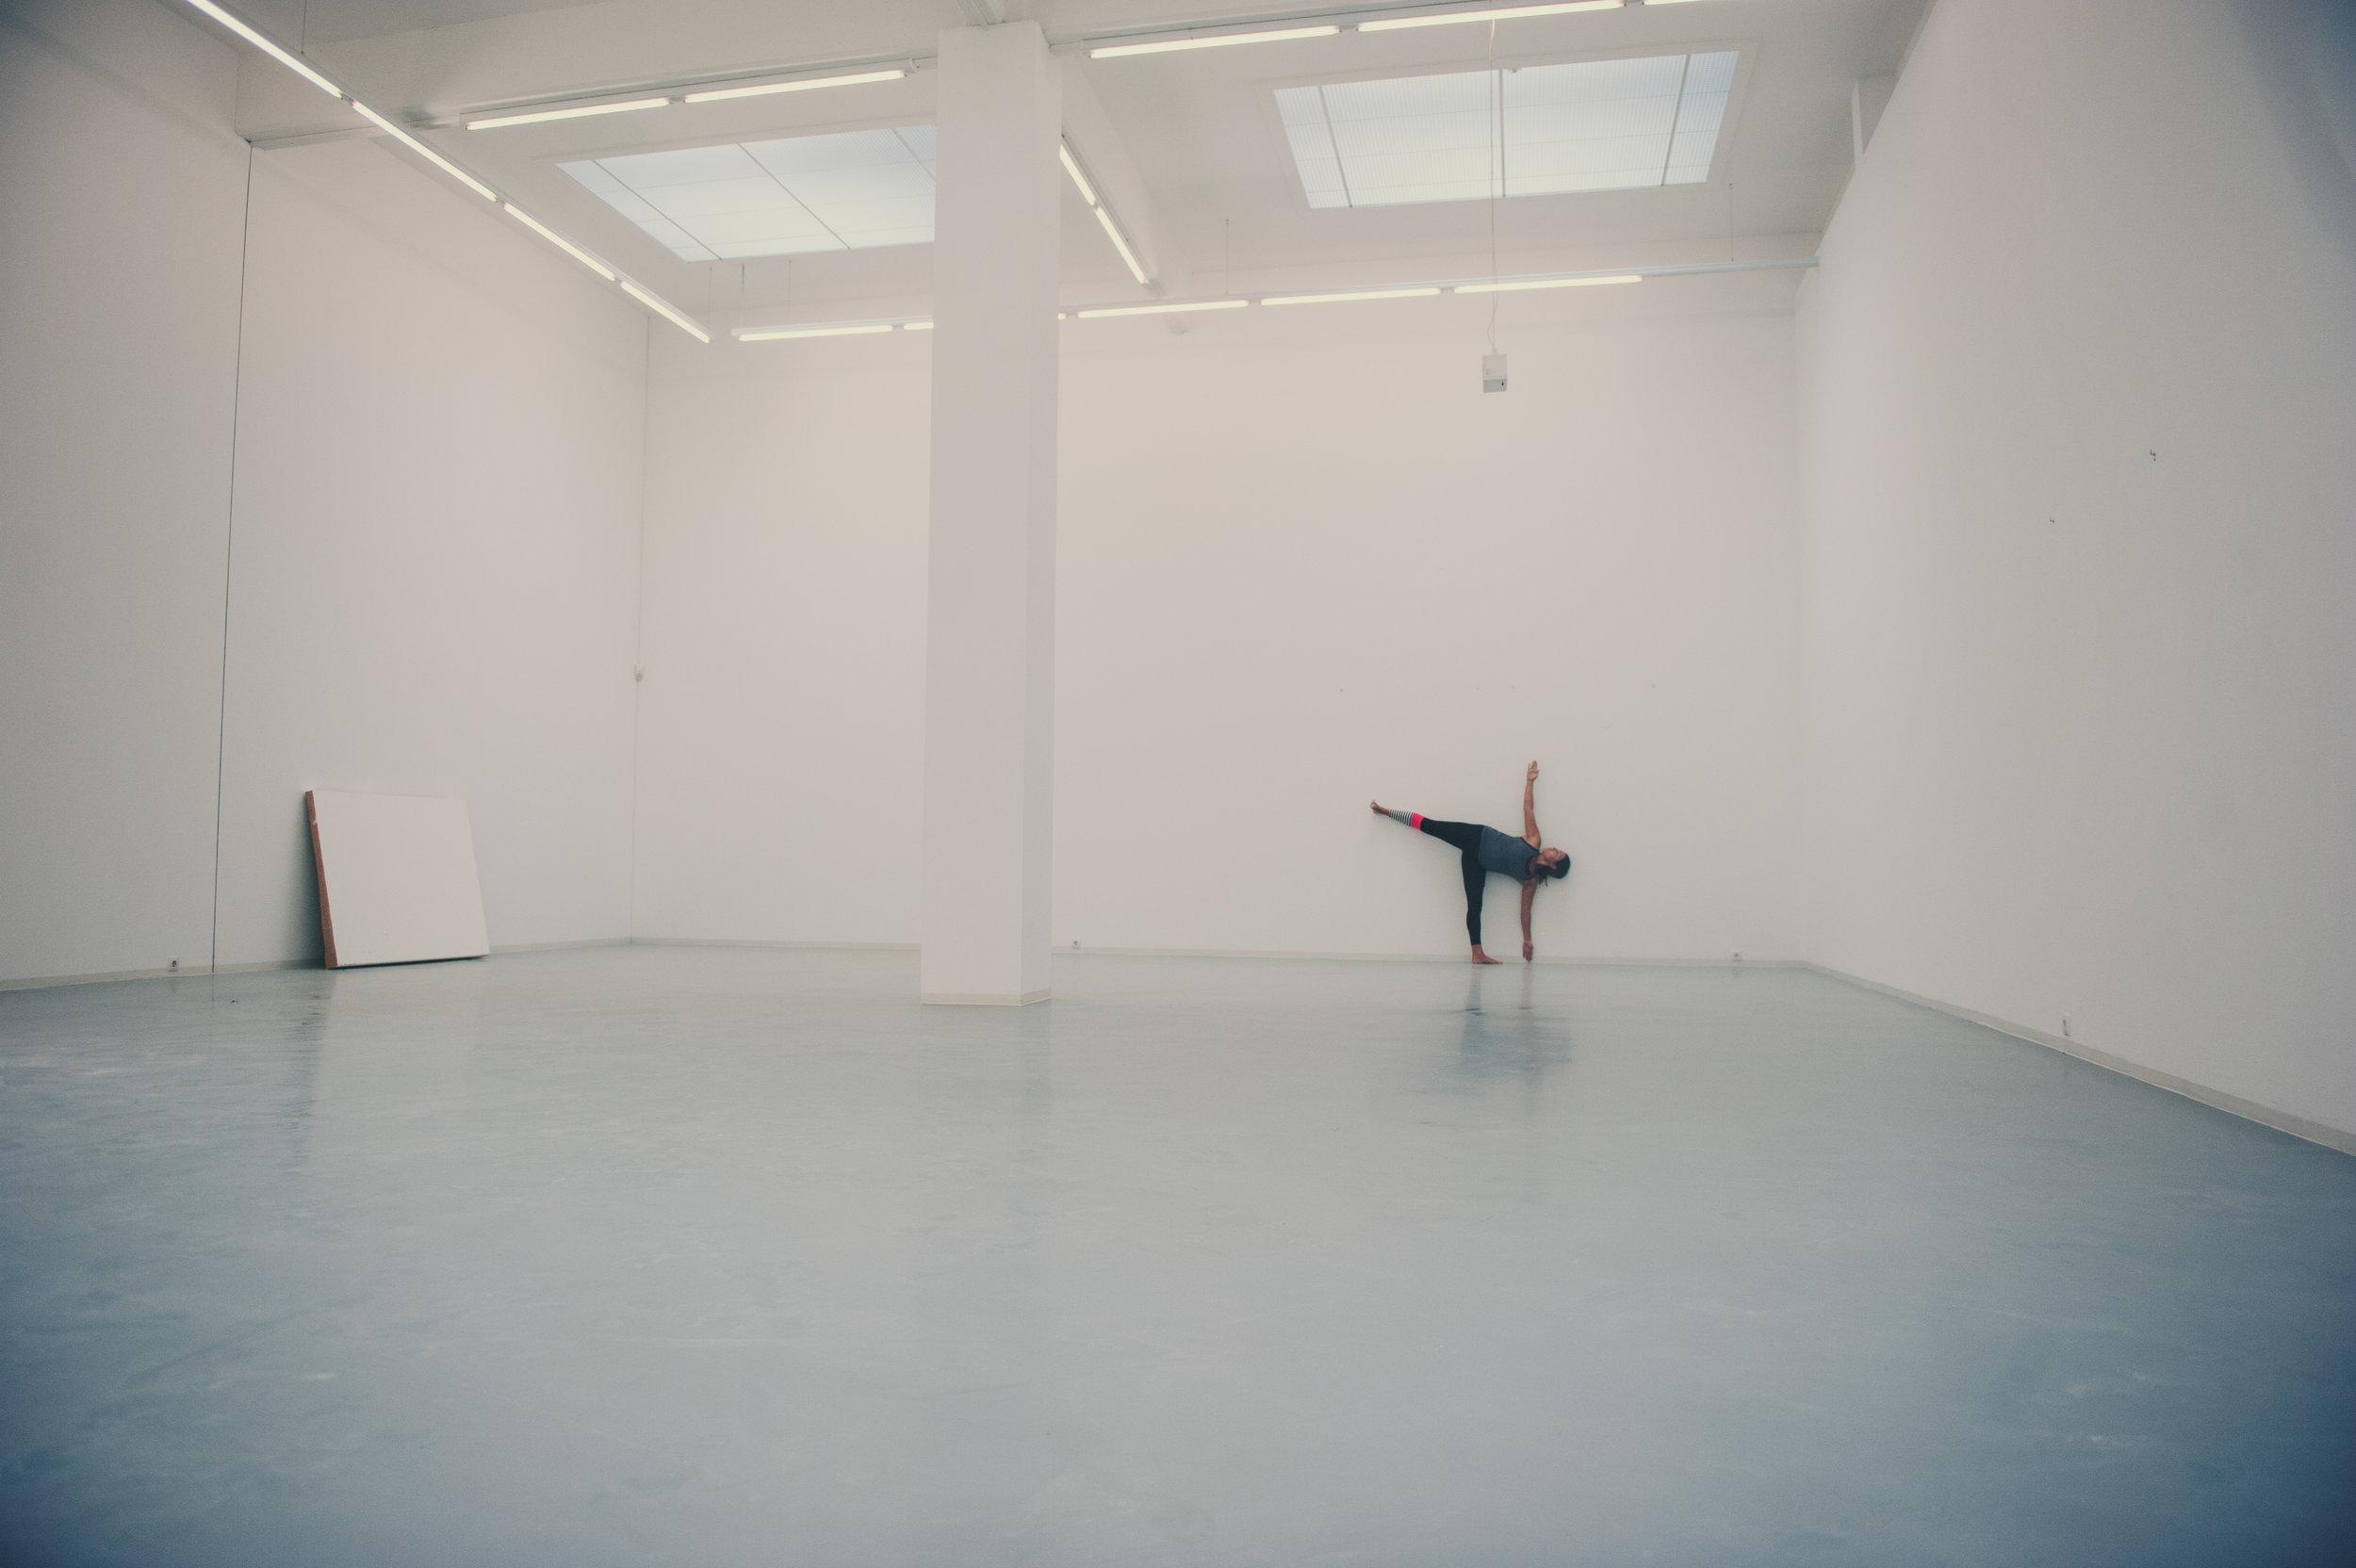 yoga-katy-scherer-kunstverein-3.jpg